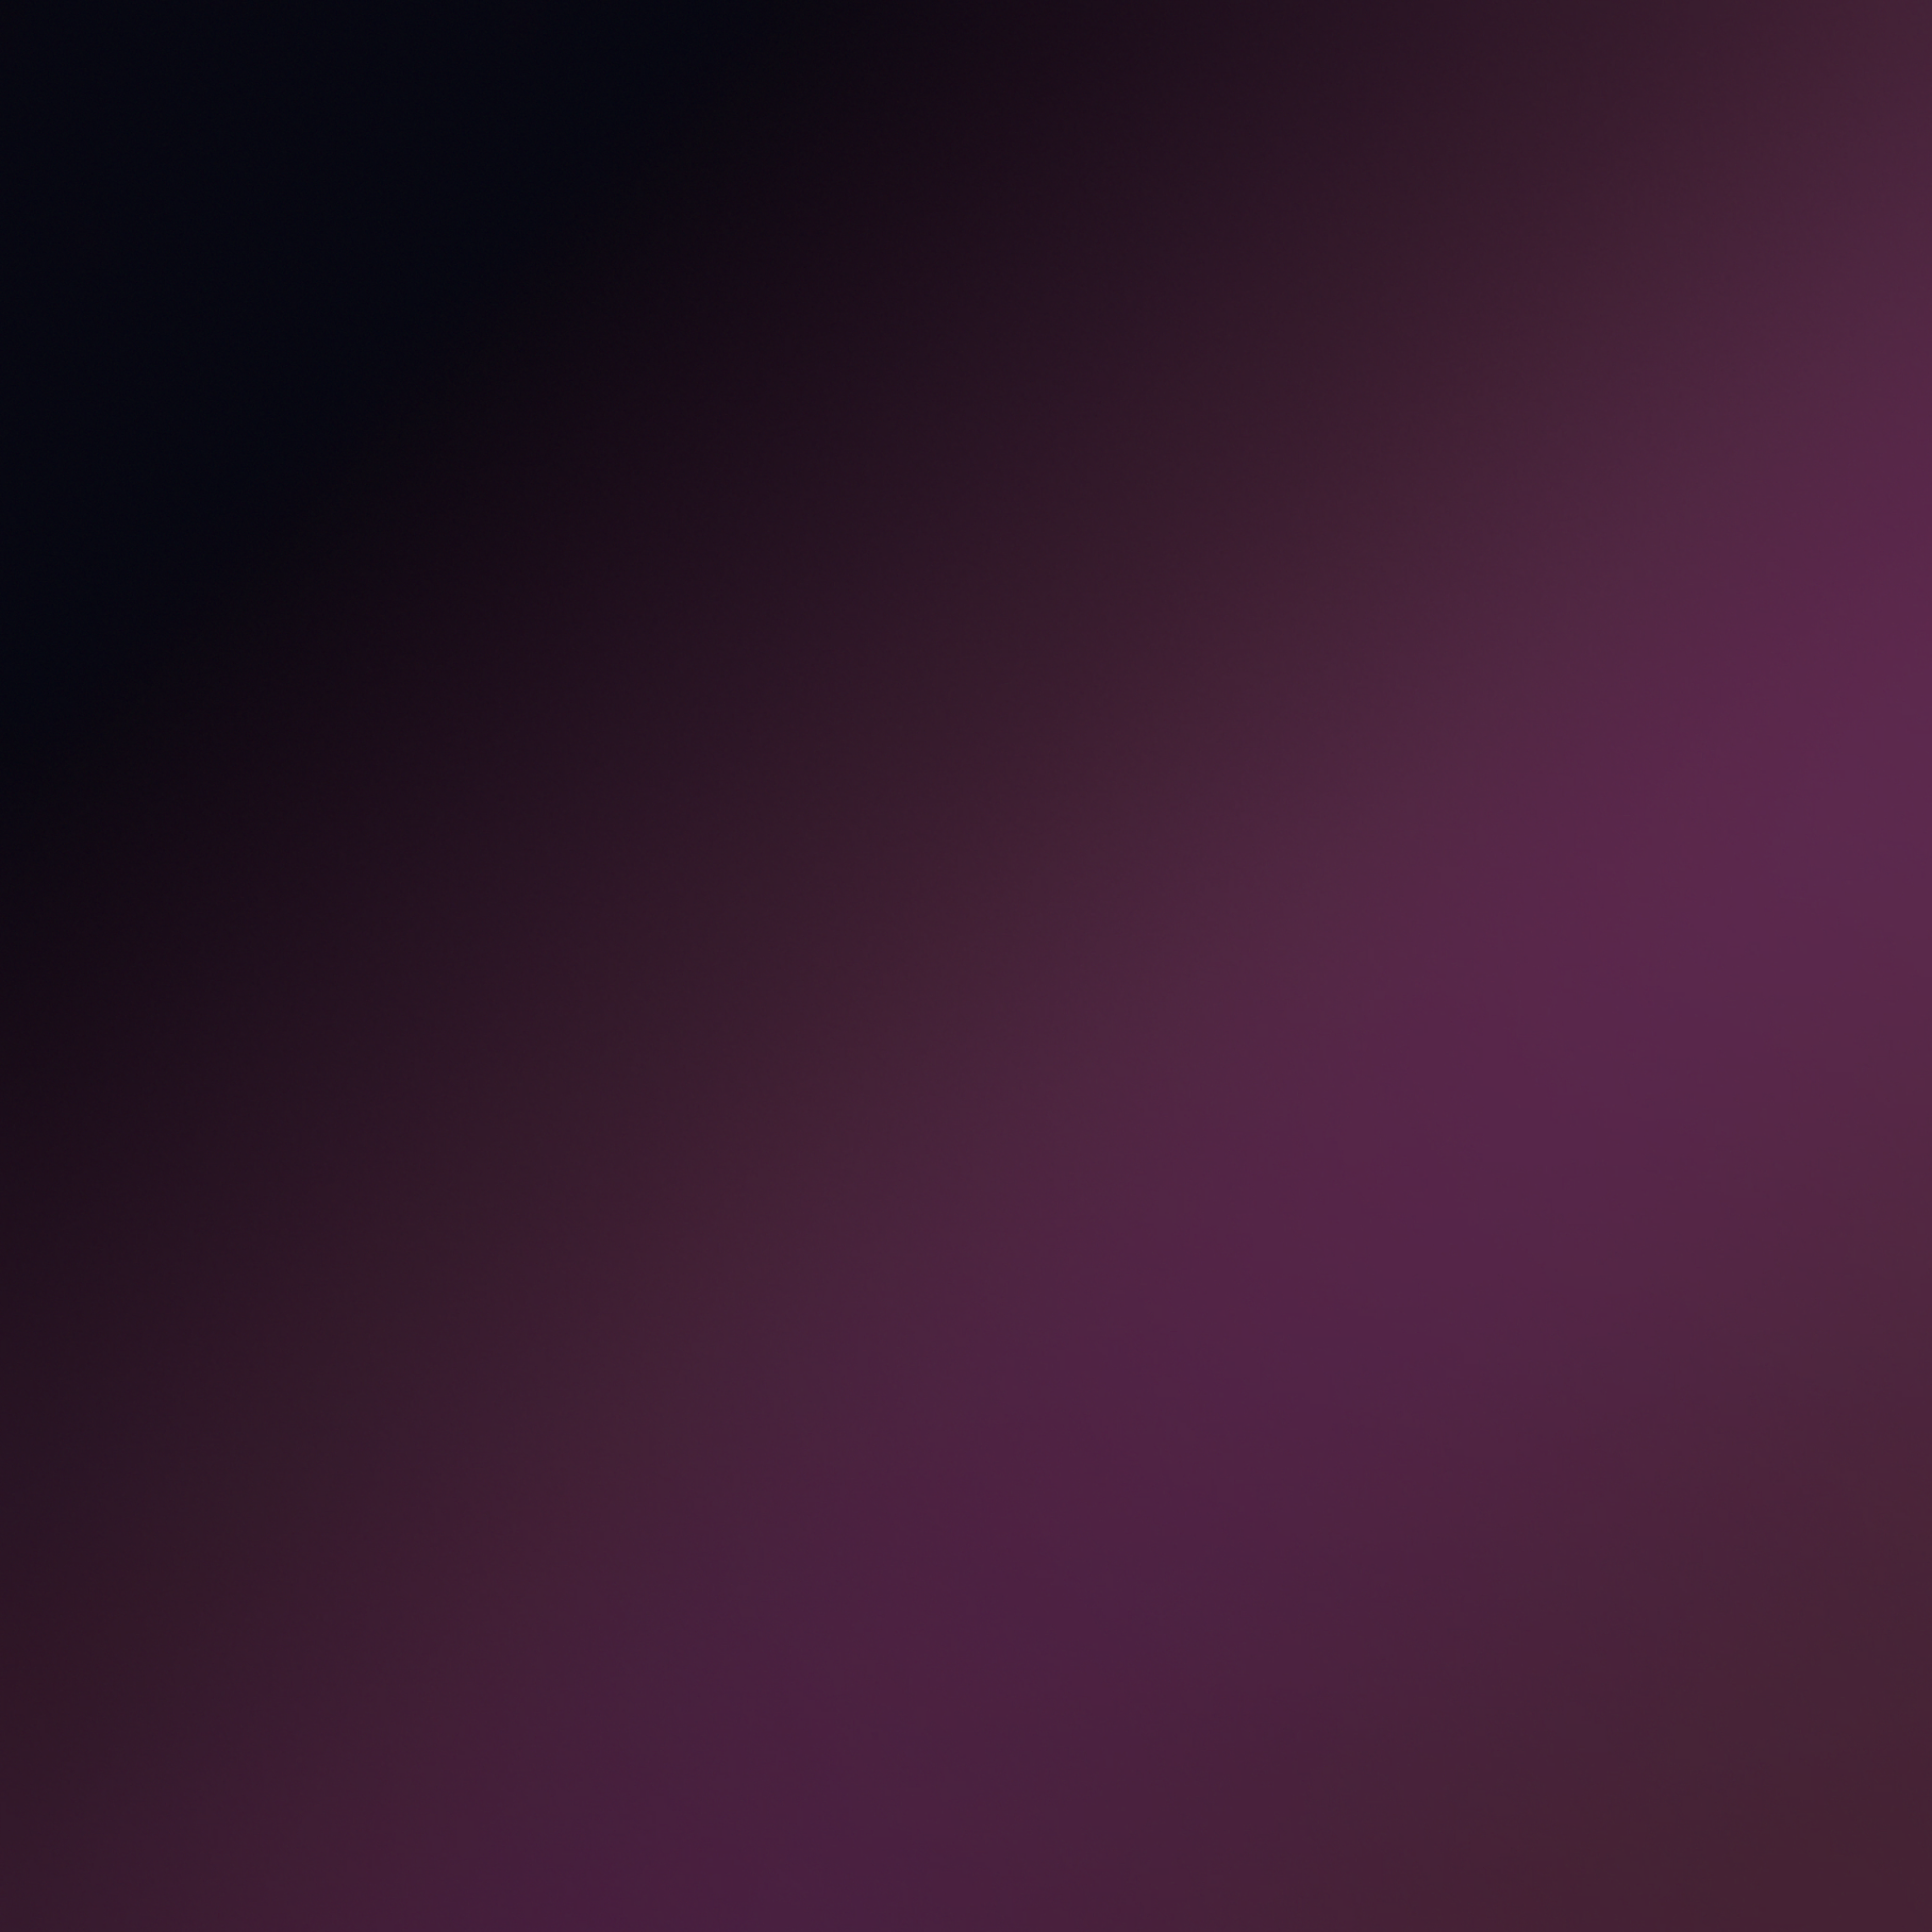 Must see Wallpaper Home Screen Xperia - Galaxy-s9-wallpaper-8-techfoogle  HD_449824.png?w\u003d300